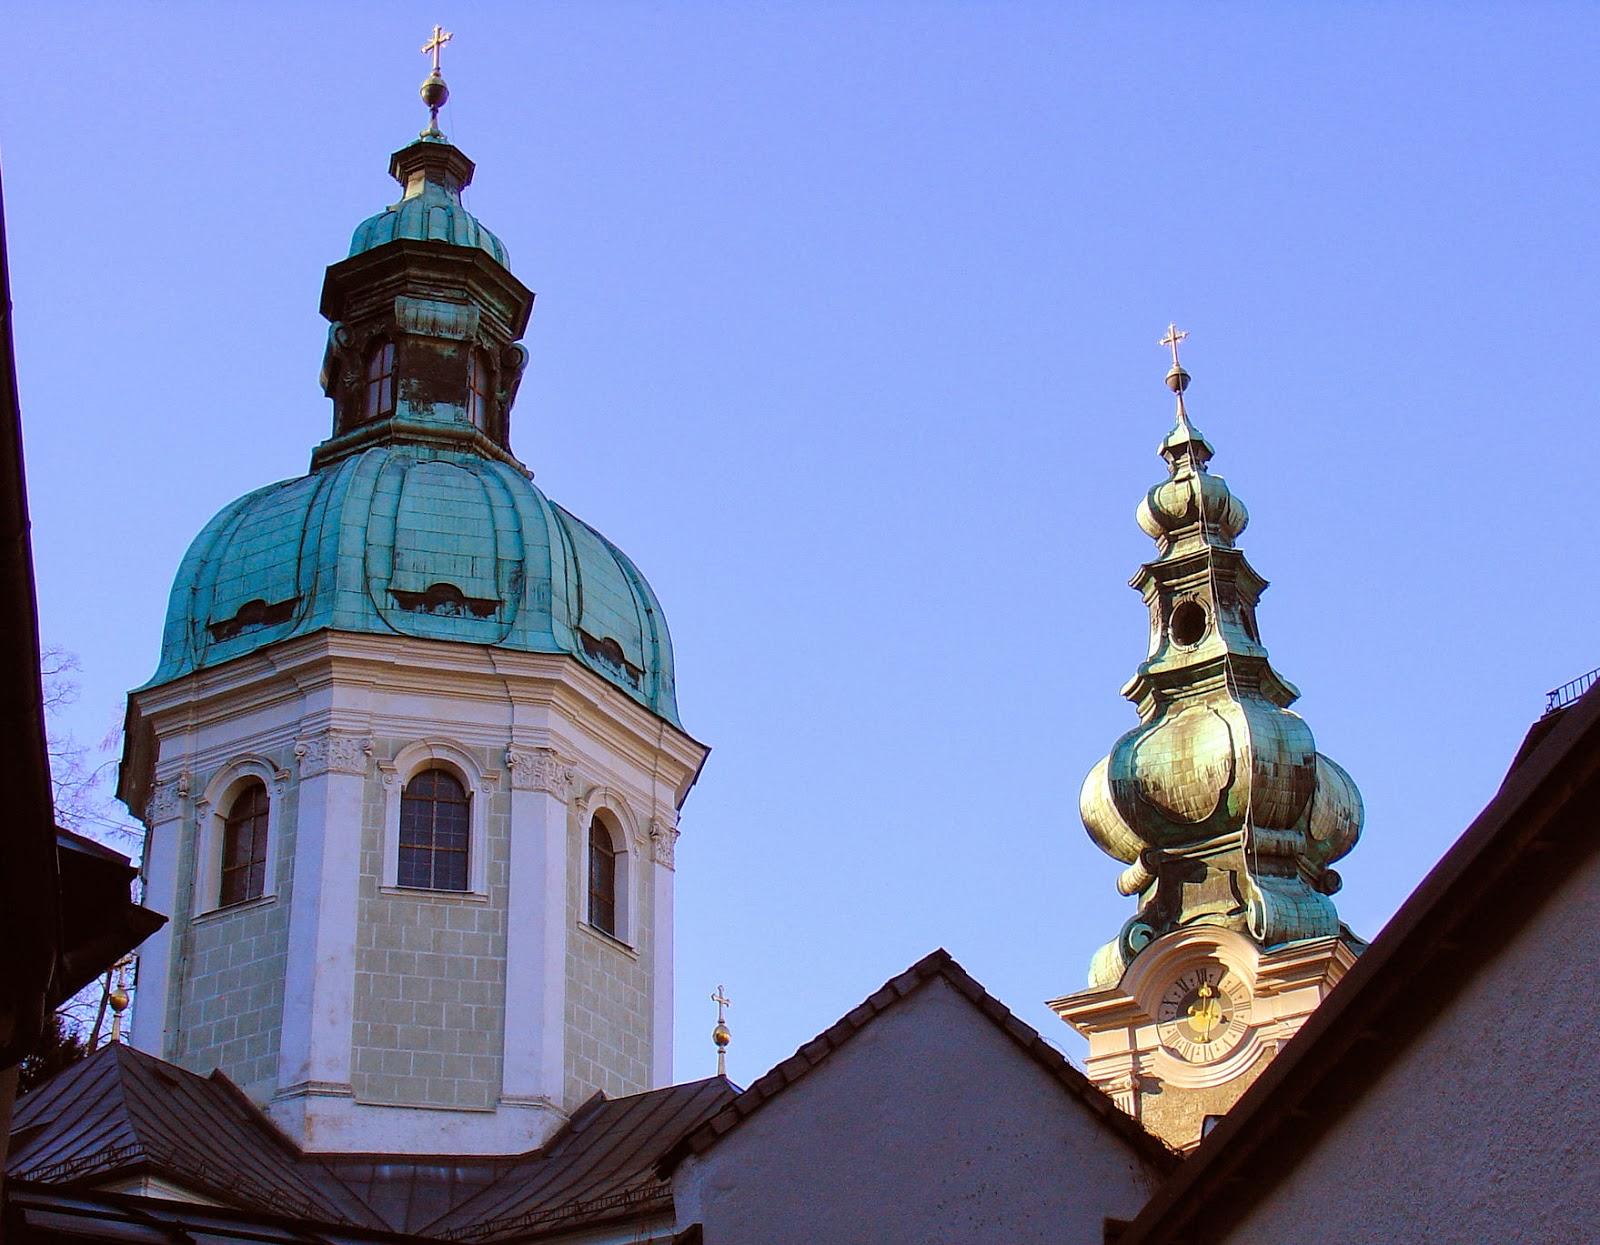 The Baroque cupola of Saint Peter's Abbey in Salzburg, Austria.